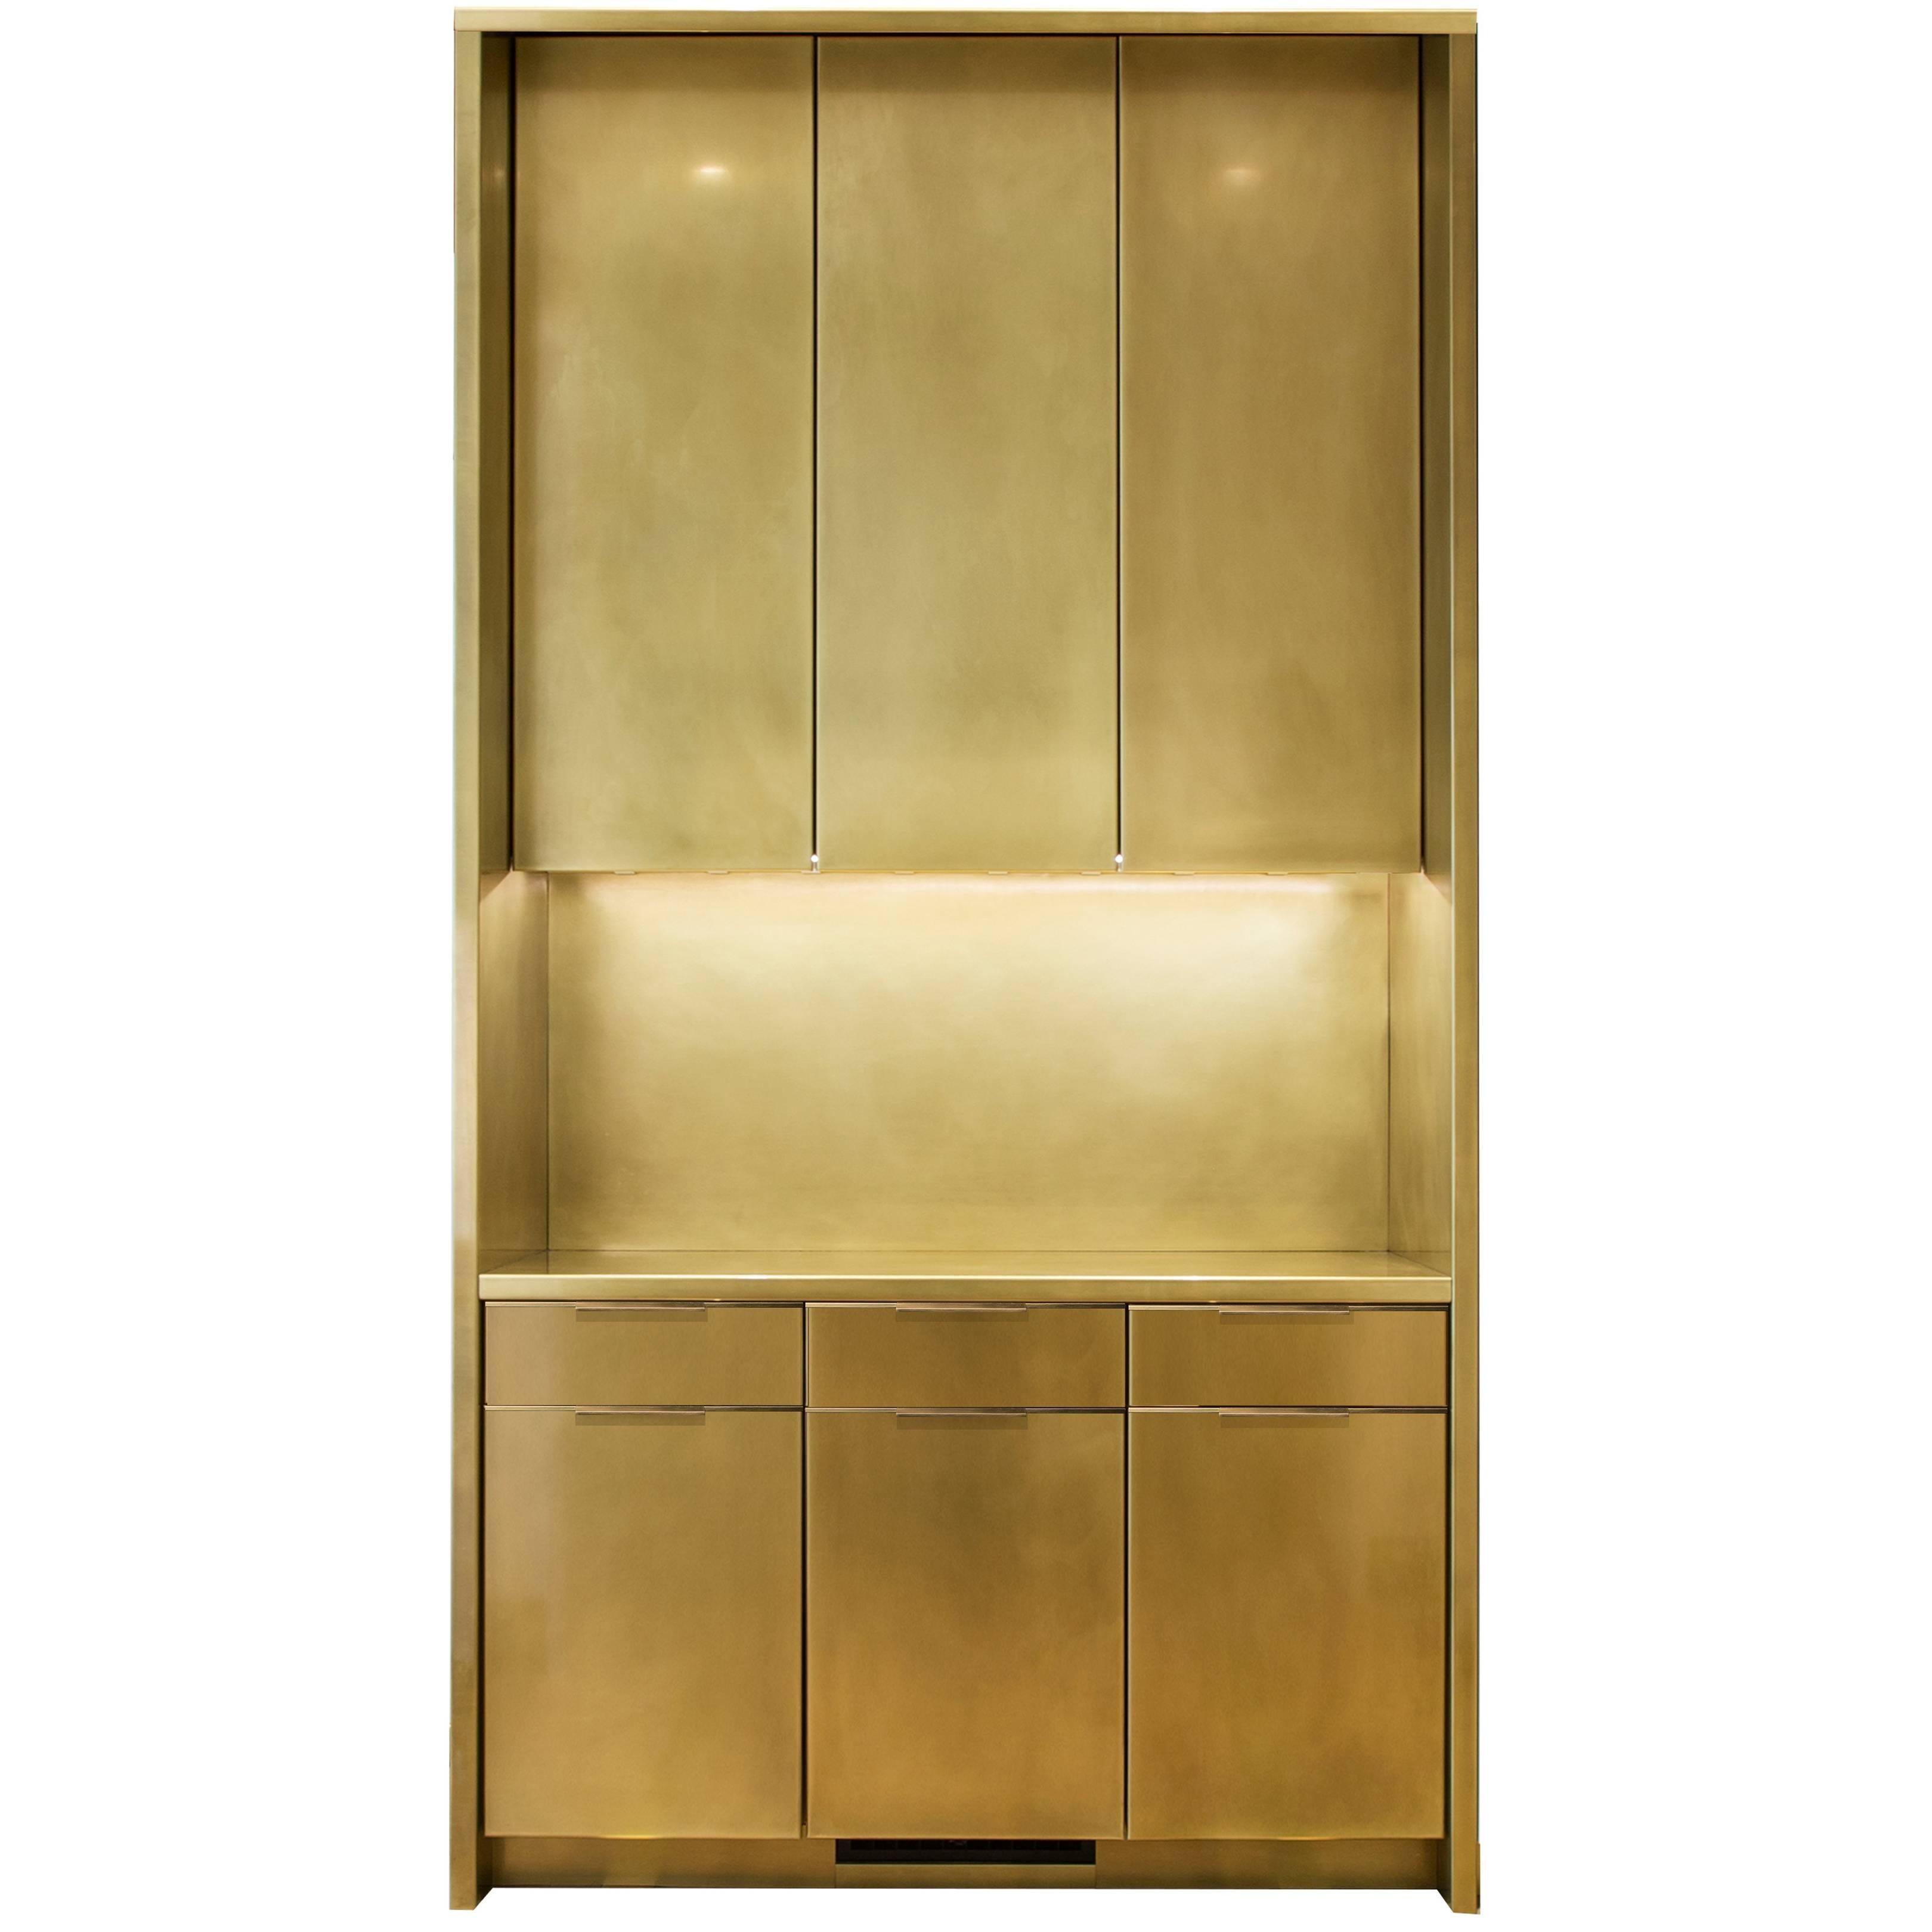 Amunealu0027s Brass Kitchen Cabinets With Warm Patina Finish And Custom Brass  Pulls 1